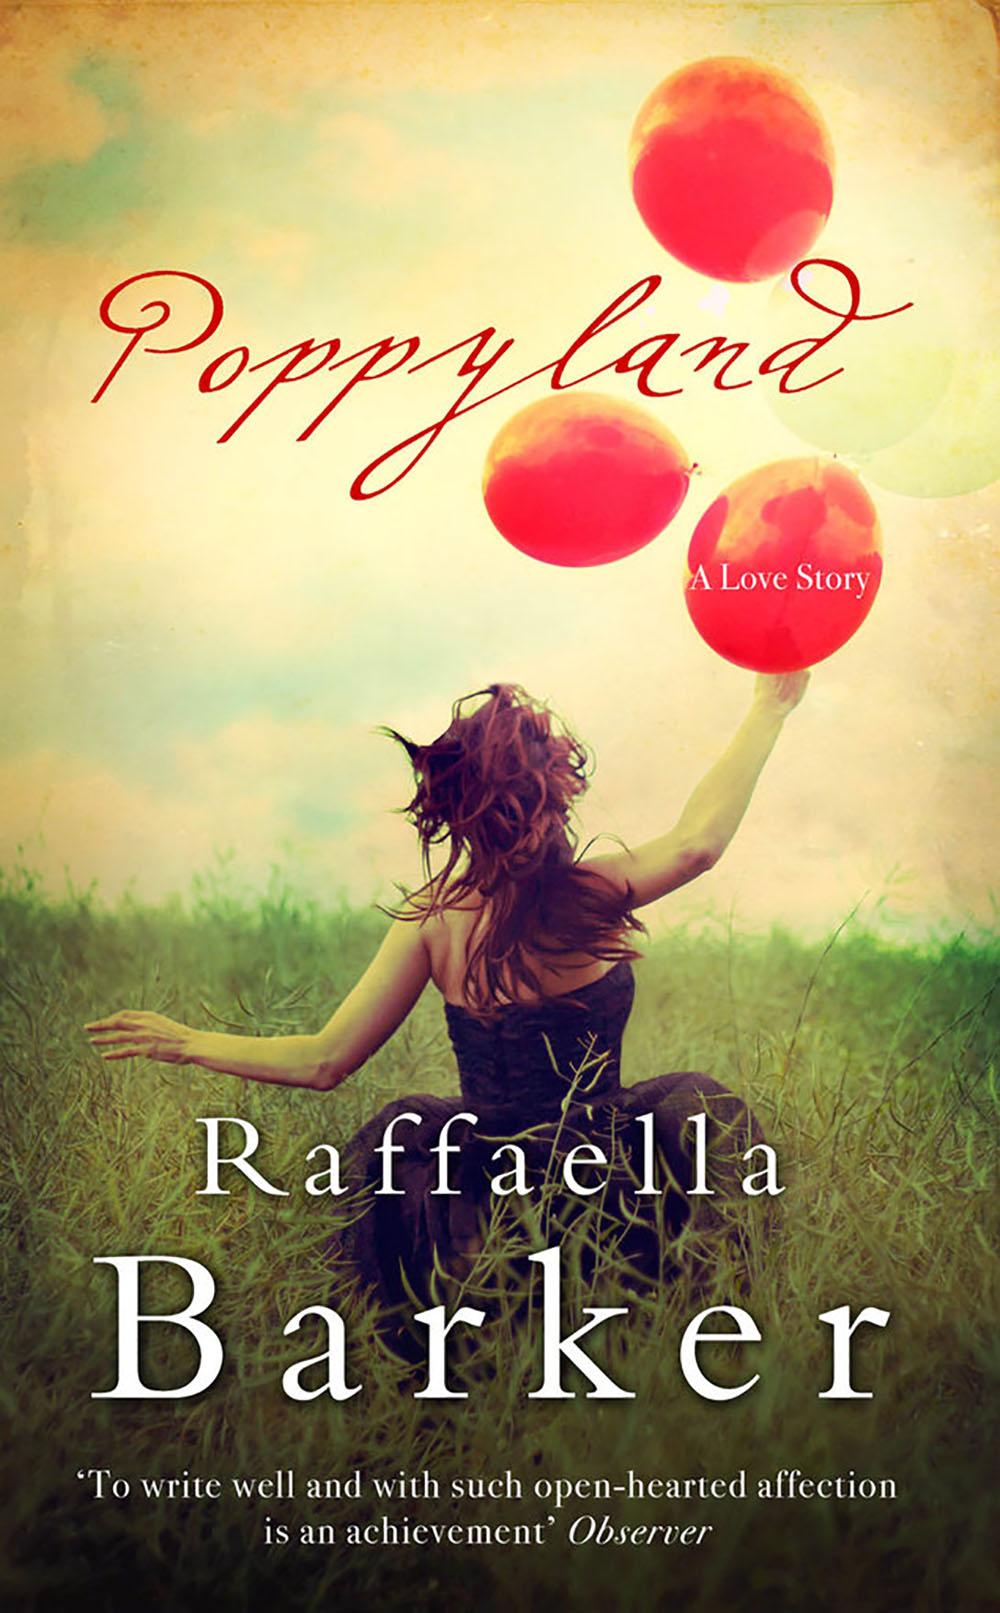 POPPY LAND by Raffaella Barker